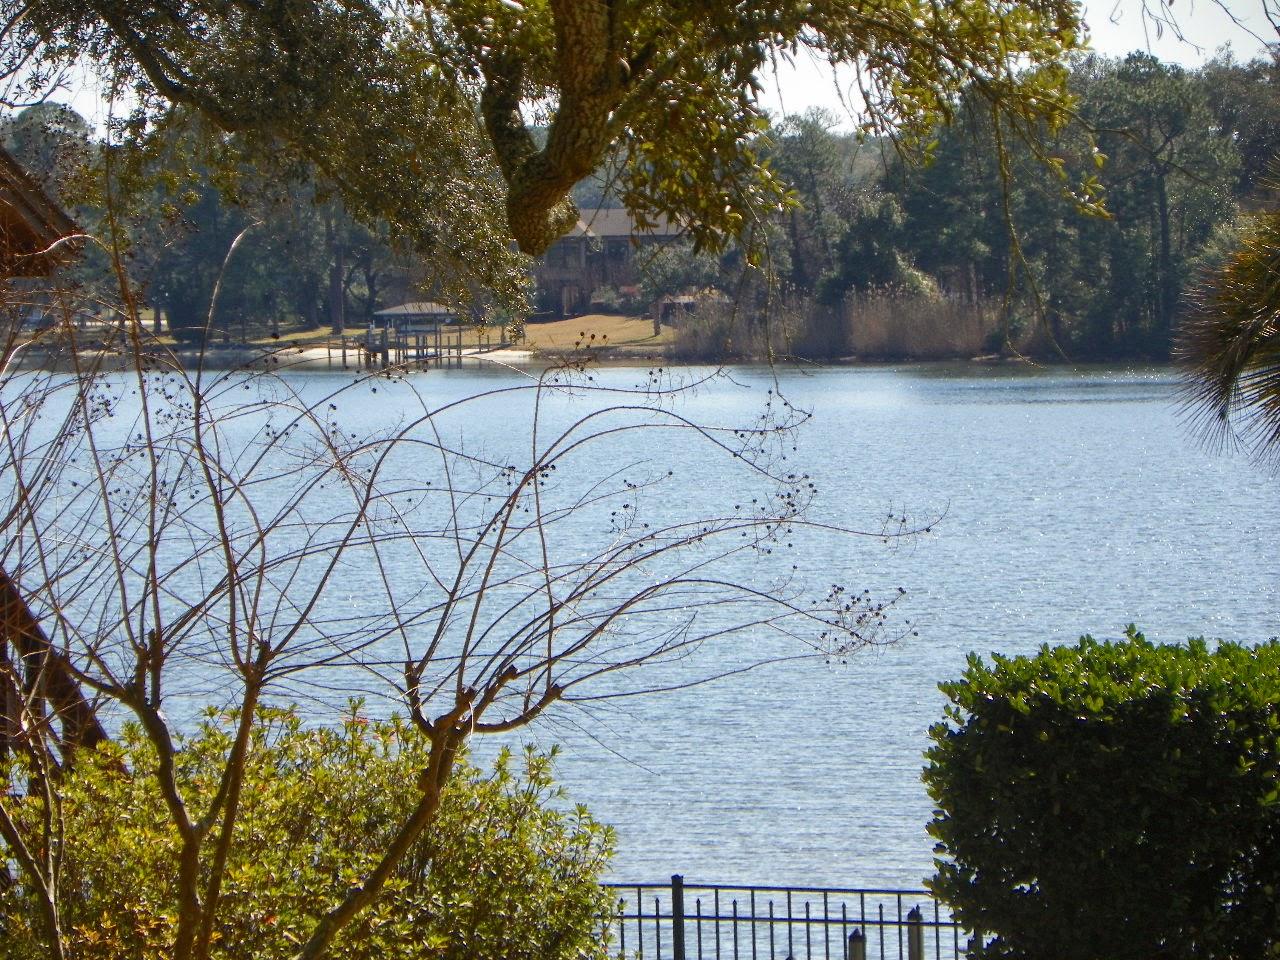 Waterfront real estate in Cordova Park, Pensacola, FL 32503